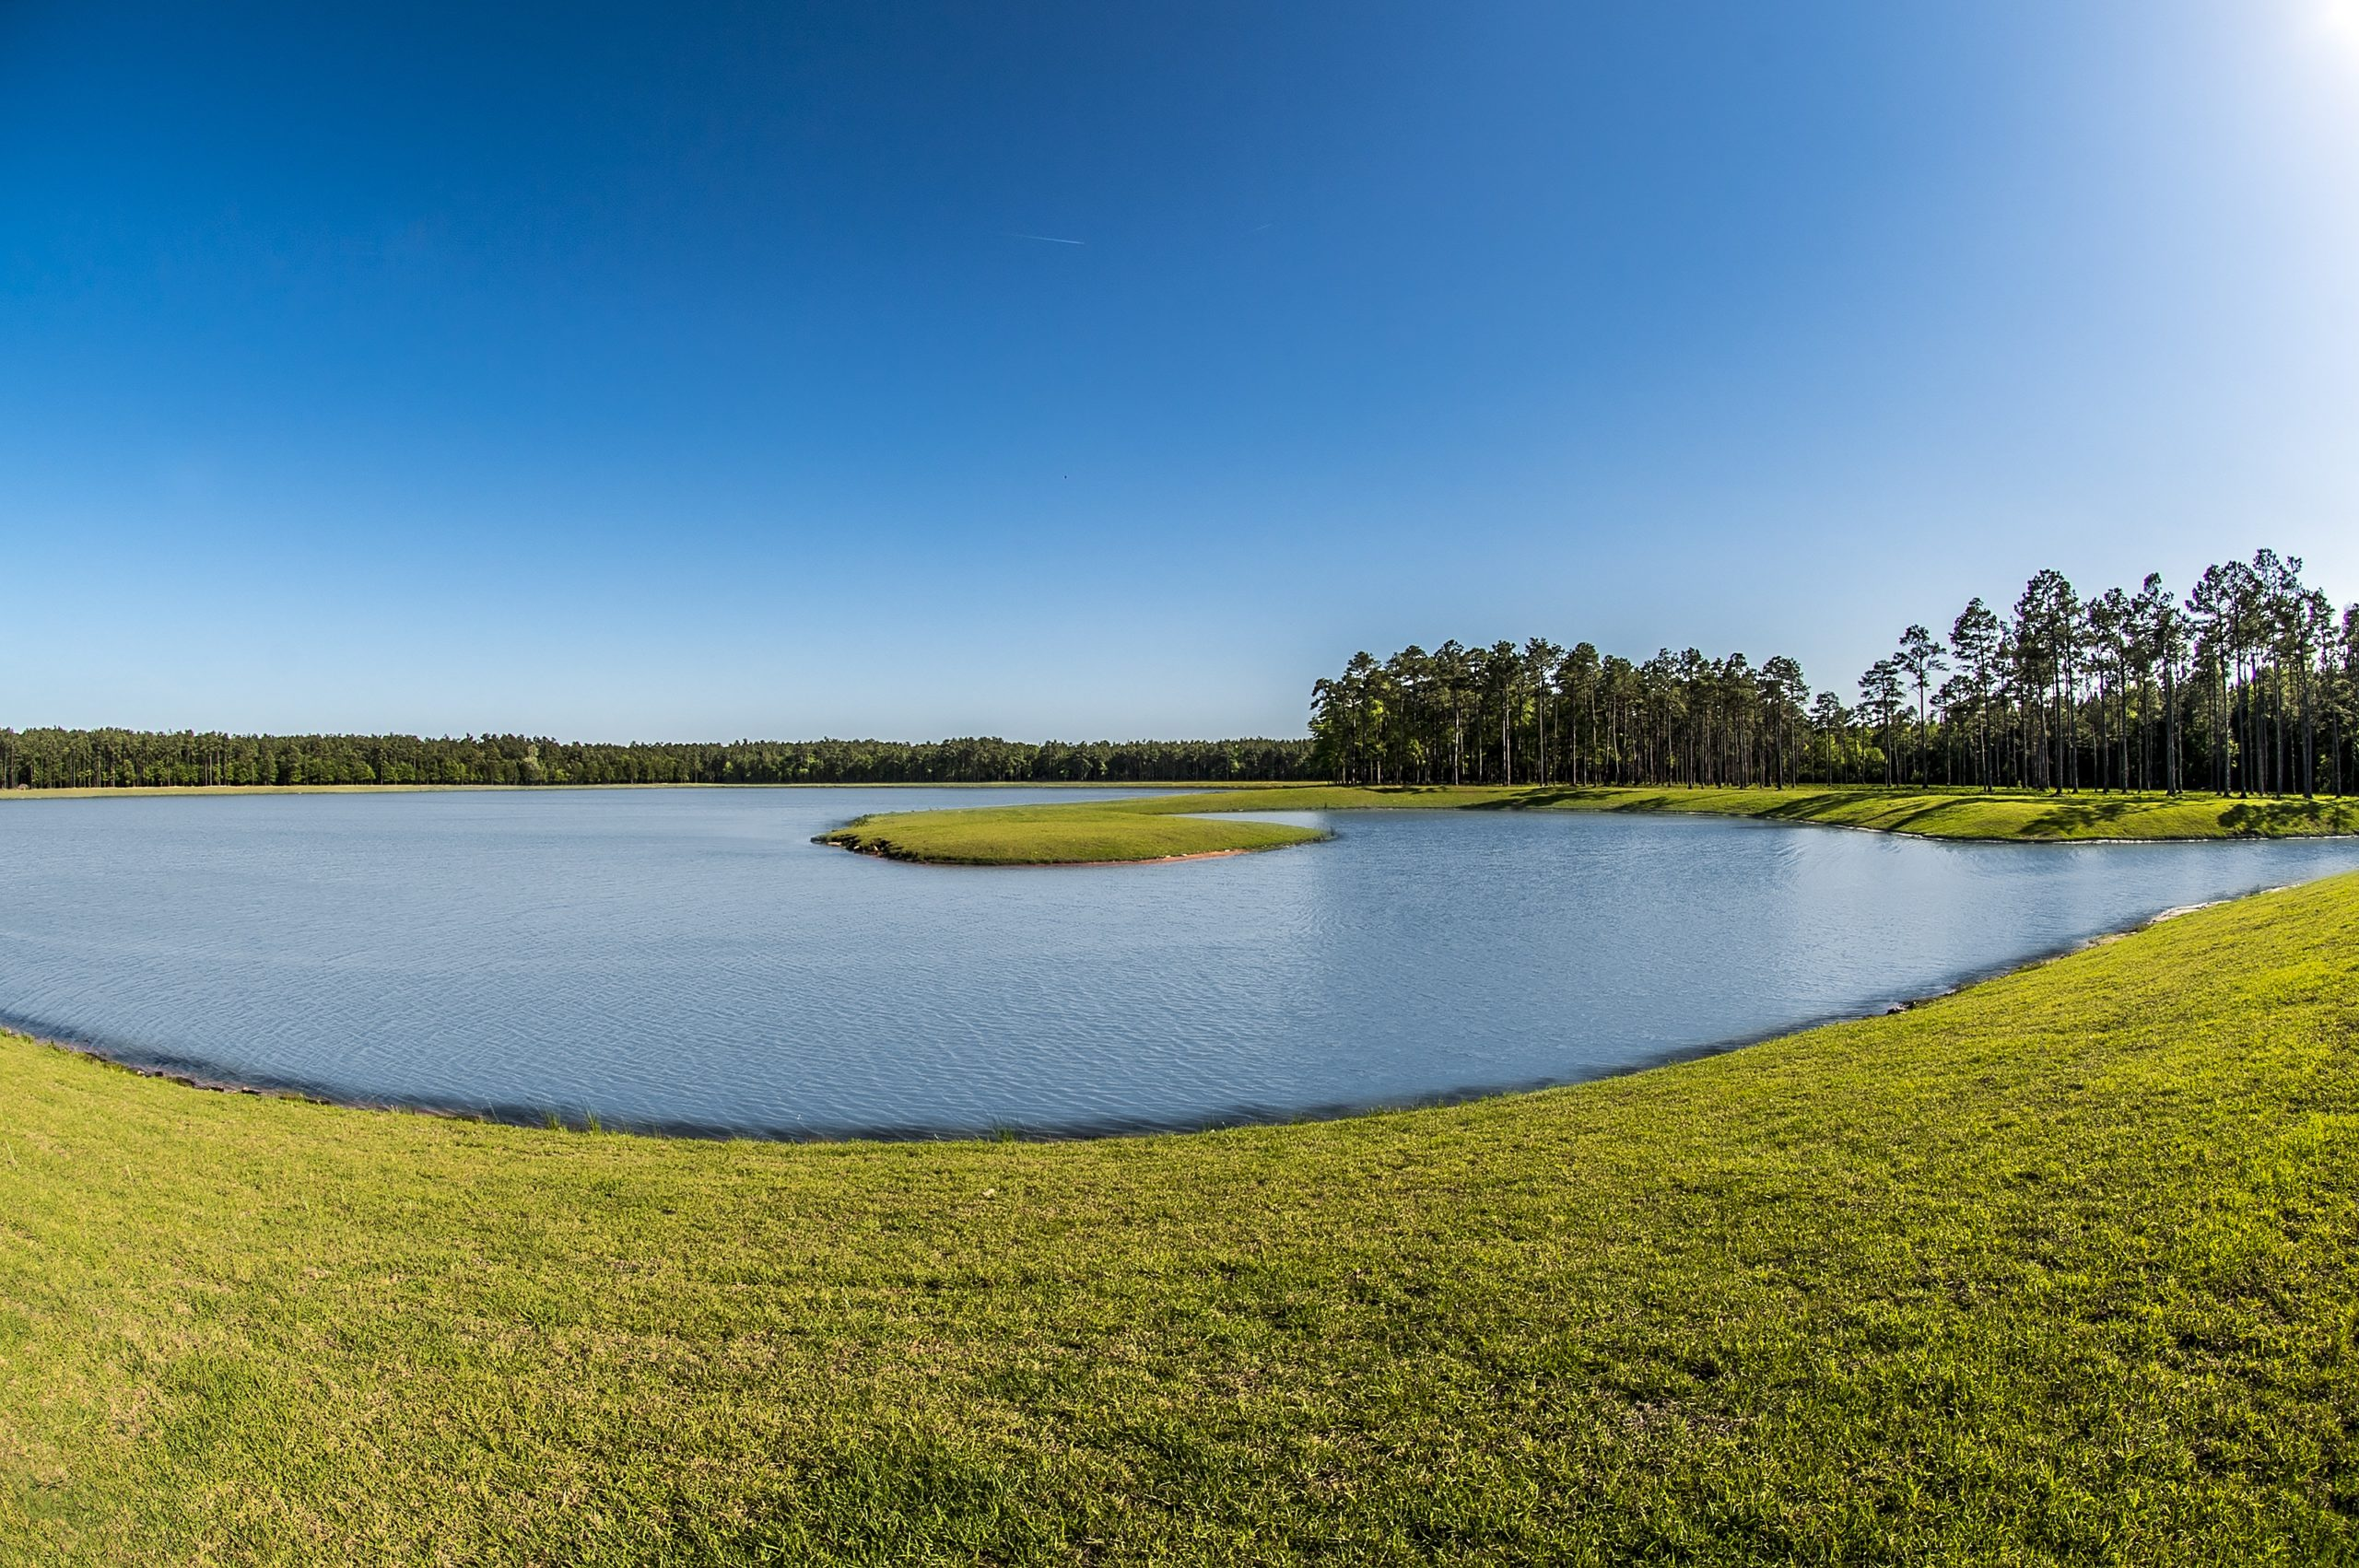 k-hov-chareleson-lakes-cane-bay (2)